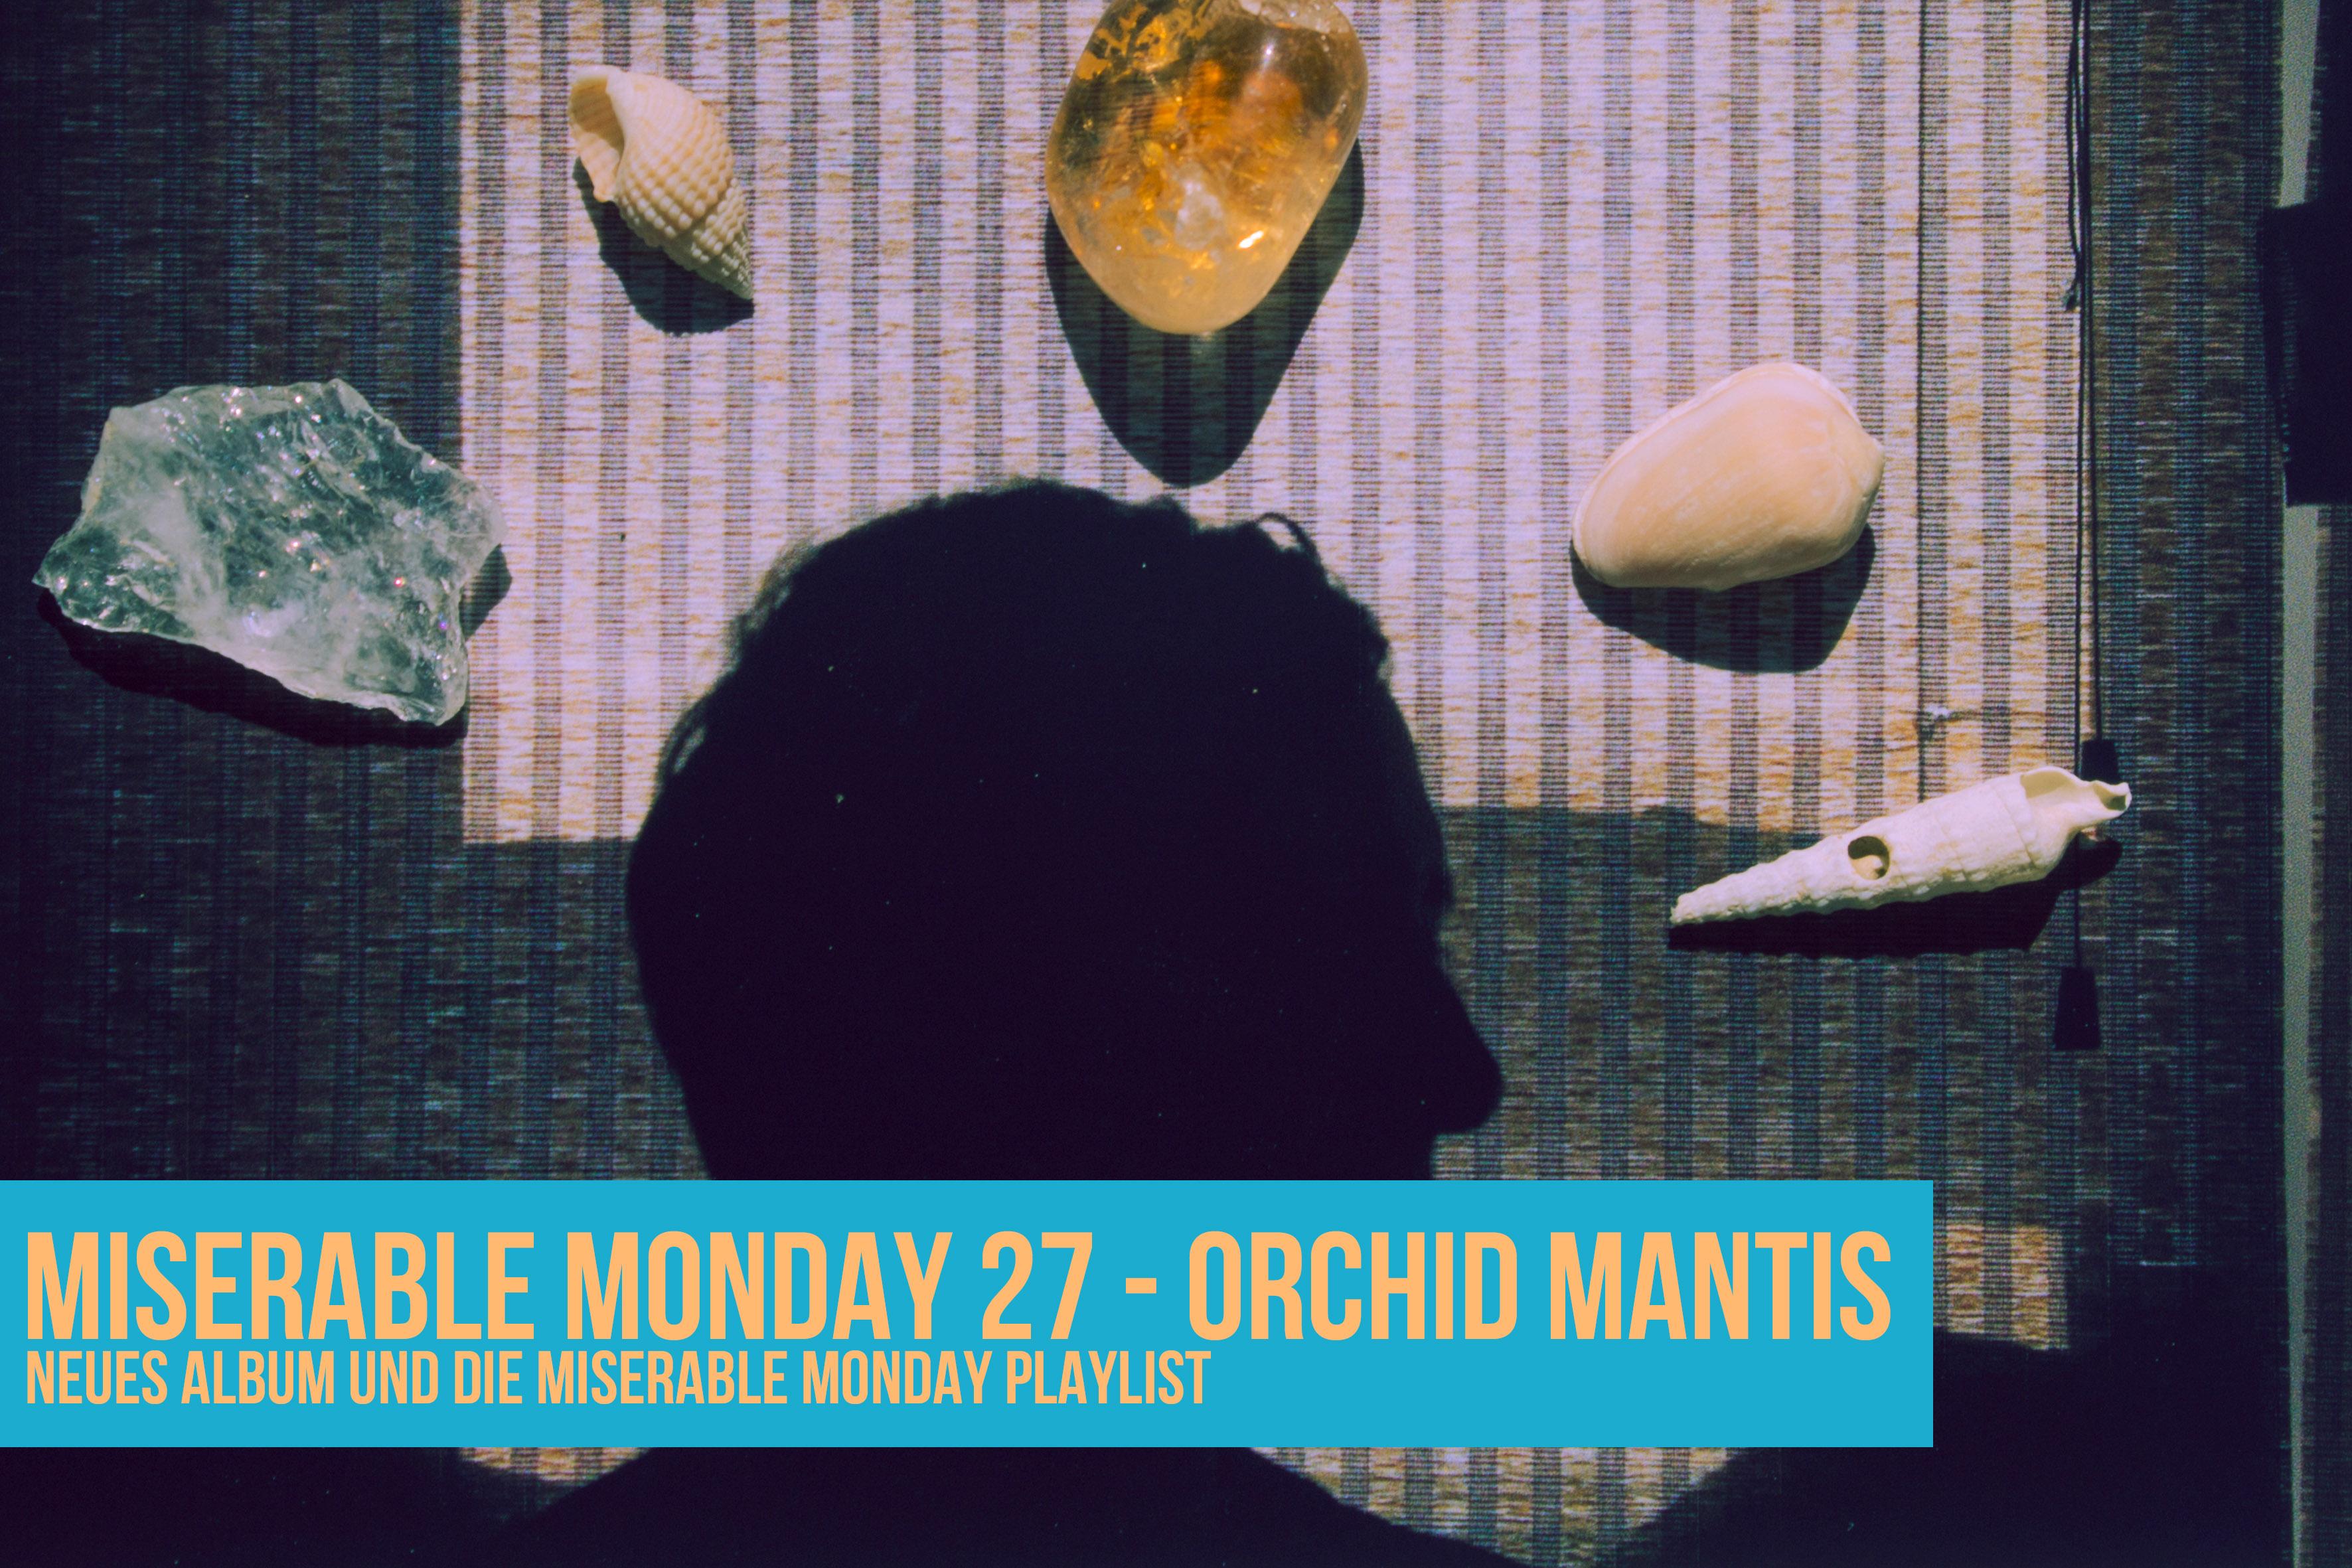 027 - Orchid Mantis